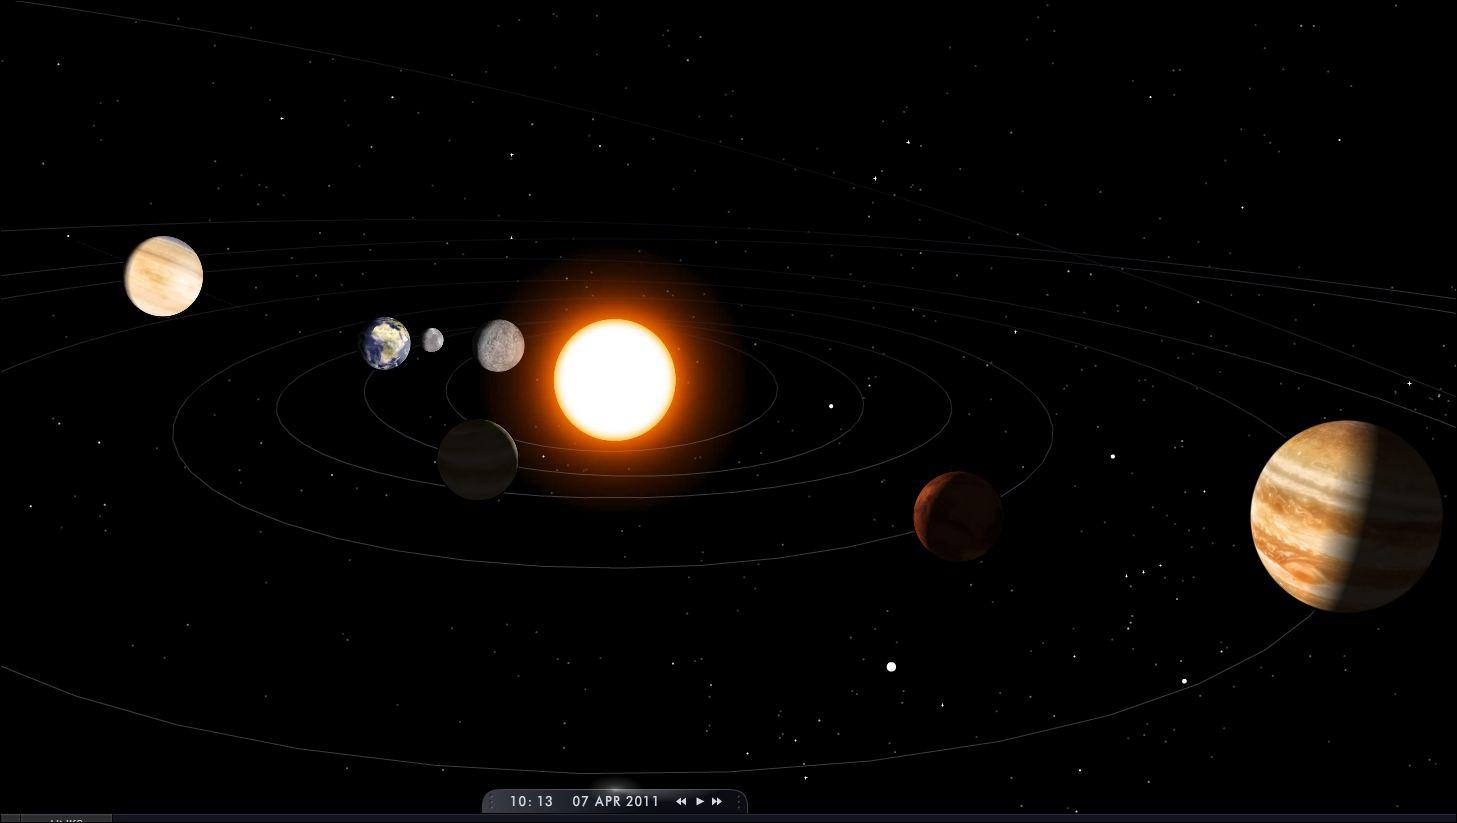 Fondos De Pantalla Sistema Solar HD 1080p